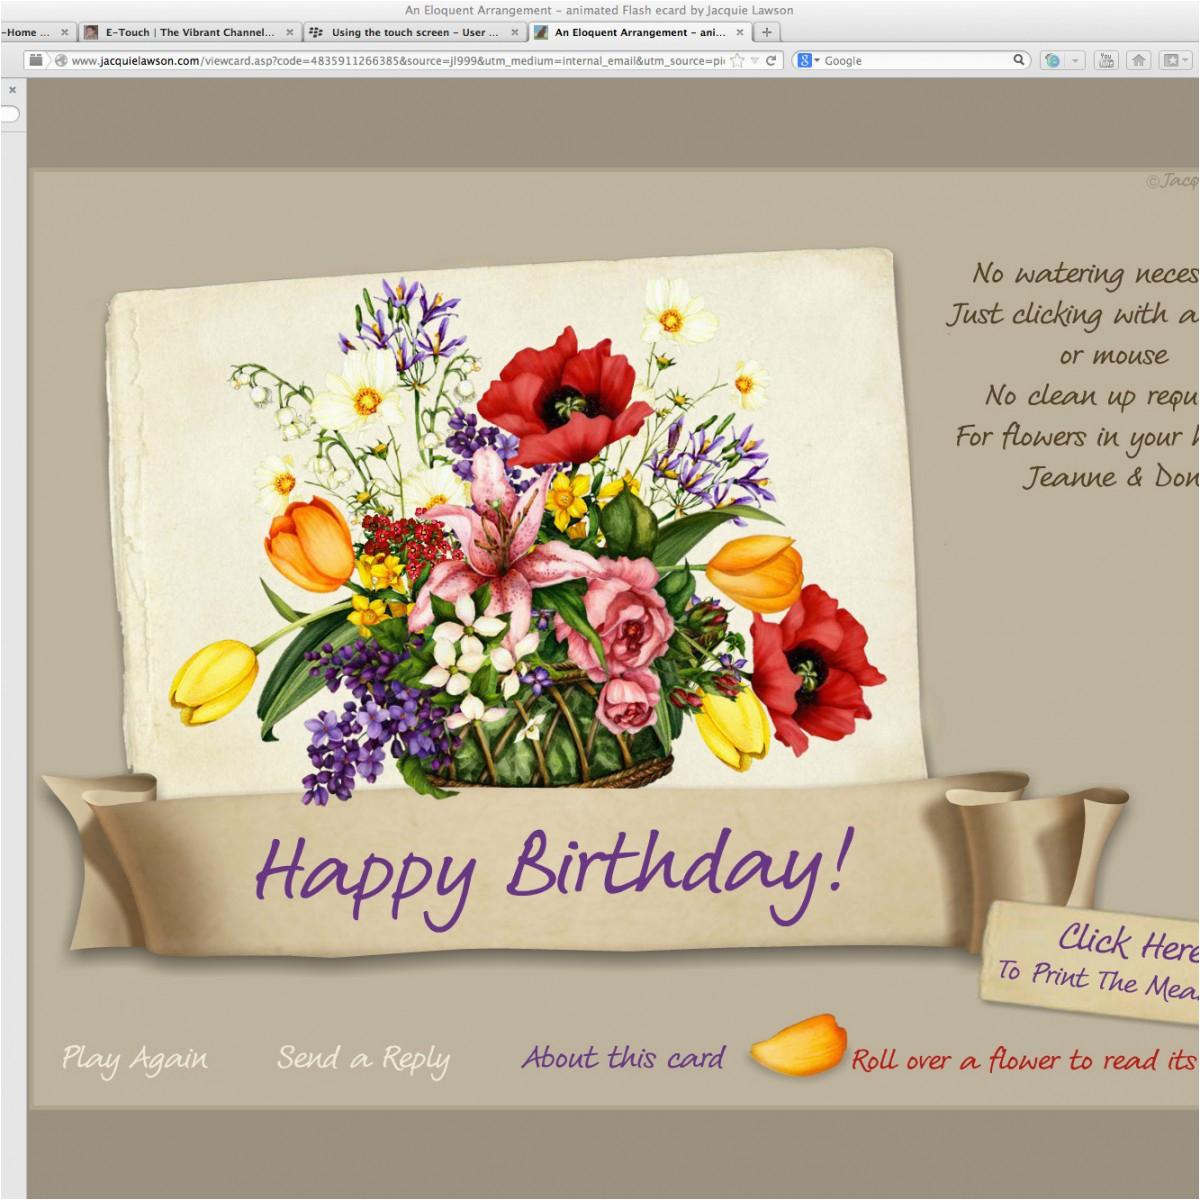 jacquie lawson birthday cards